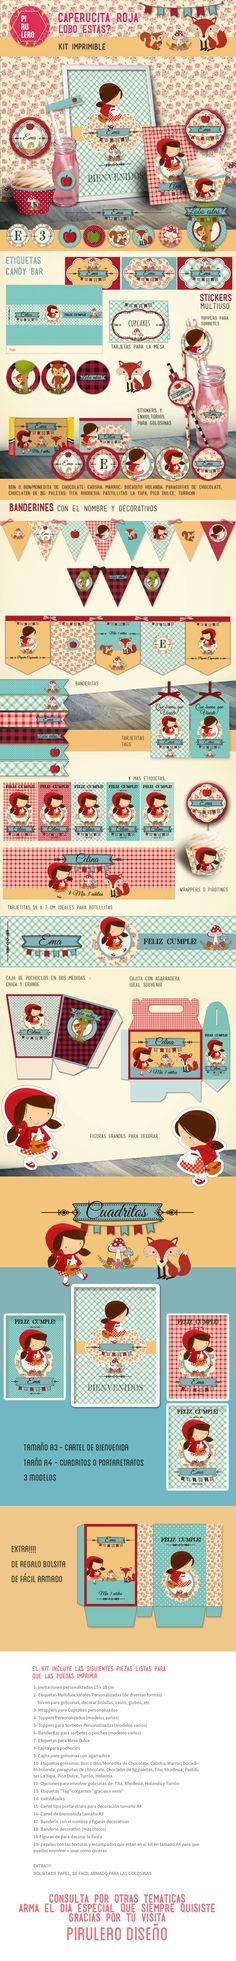 Kit imprimible Caperucita Roja Red Riding Hood #caperucita #caperucitaroja #littlered #littleredridinghood #kitimprimible #RedRidingHood